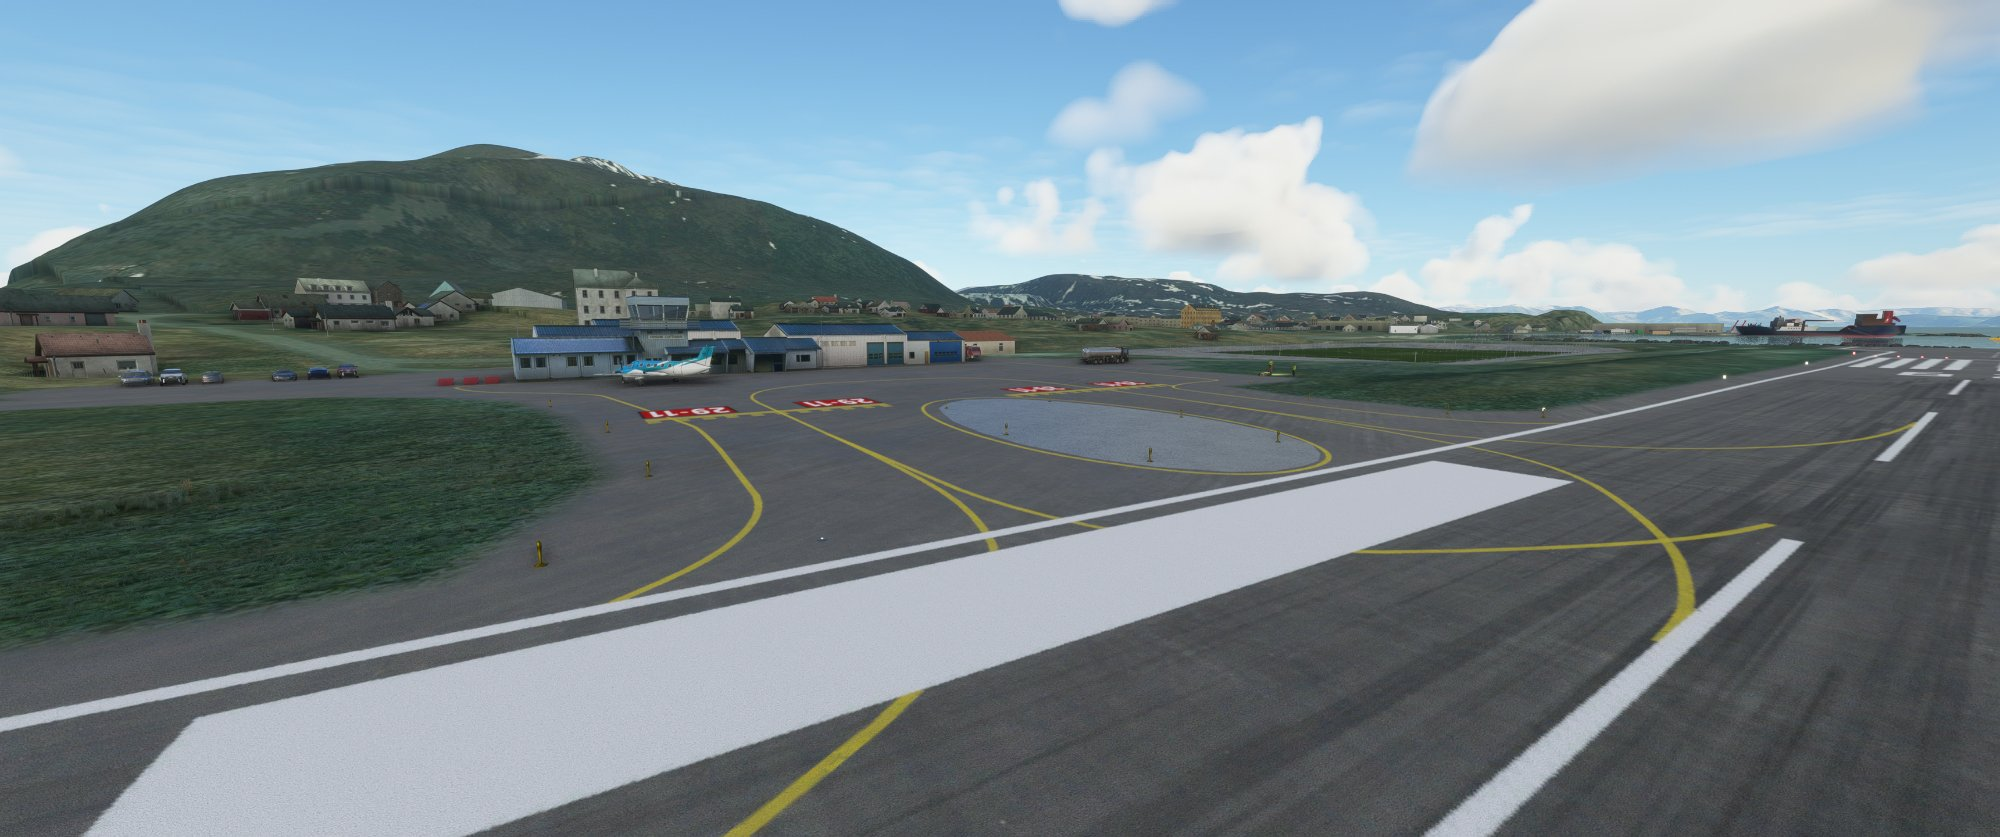 Microsoft Flight Simulator Screenshot 2020.11.19 - 17.51.02.33.jpg